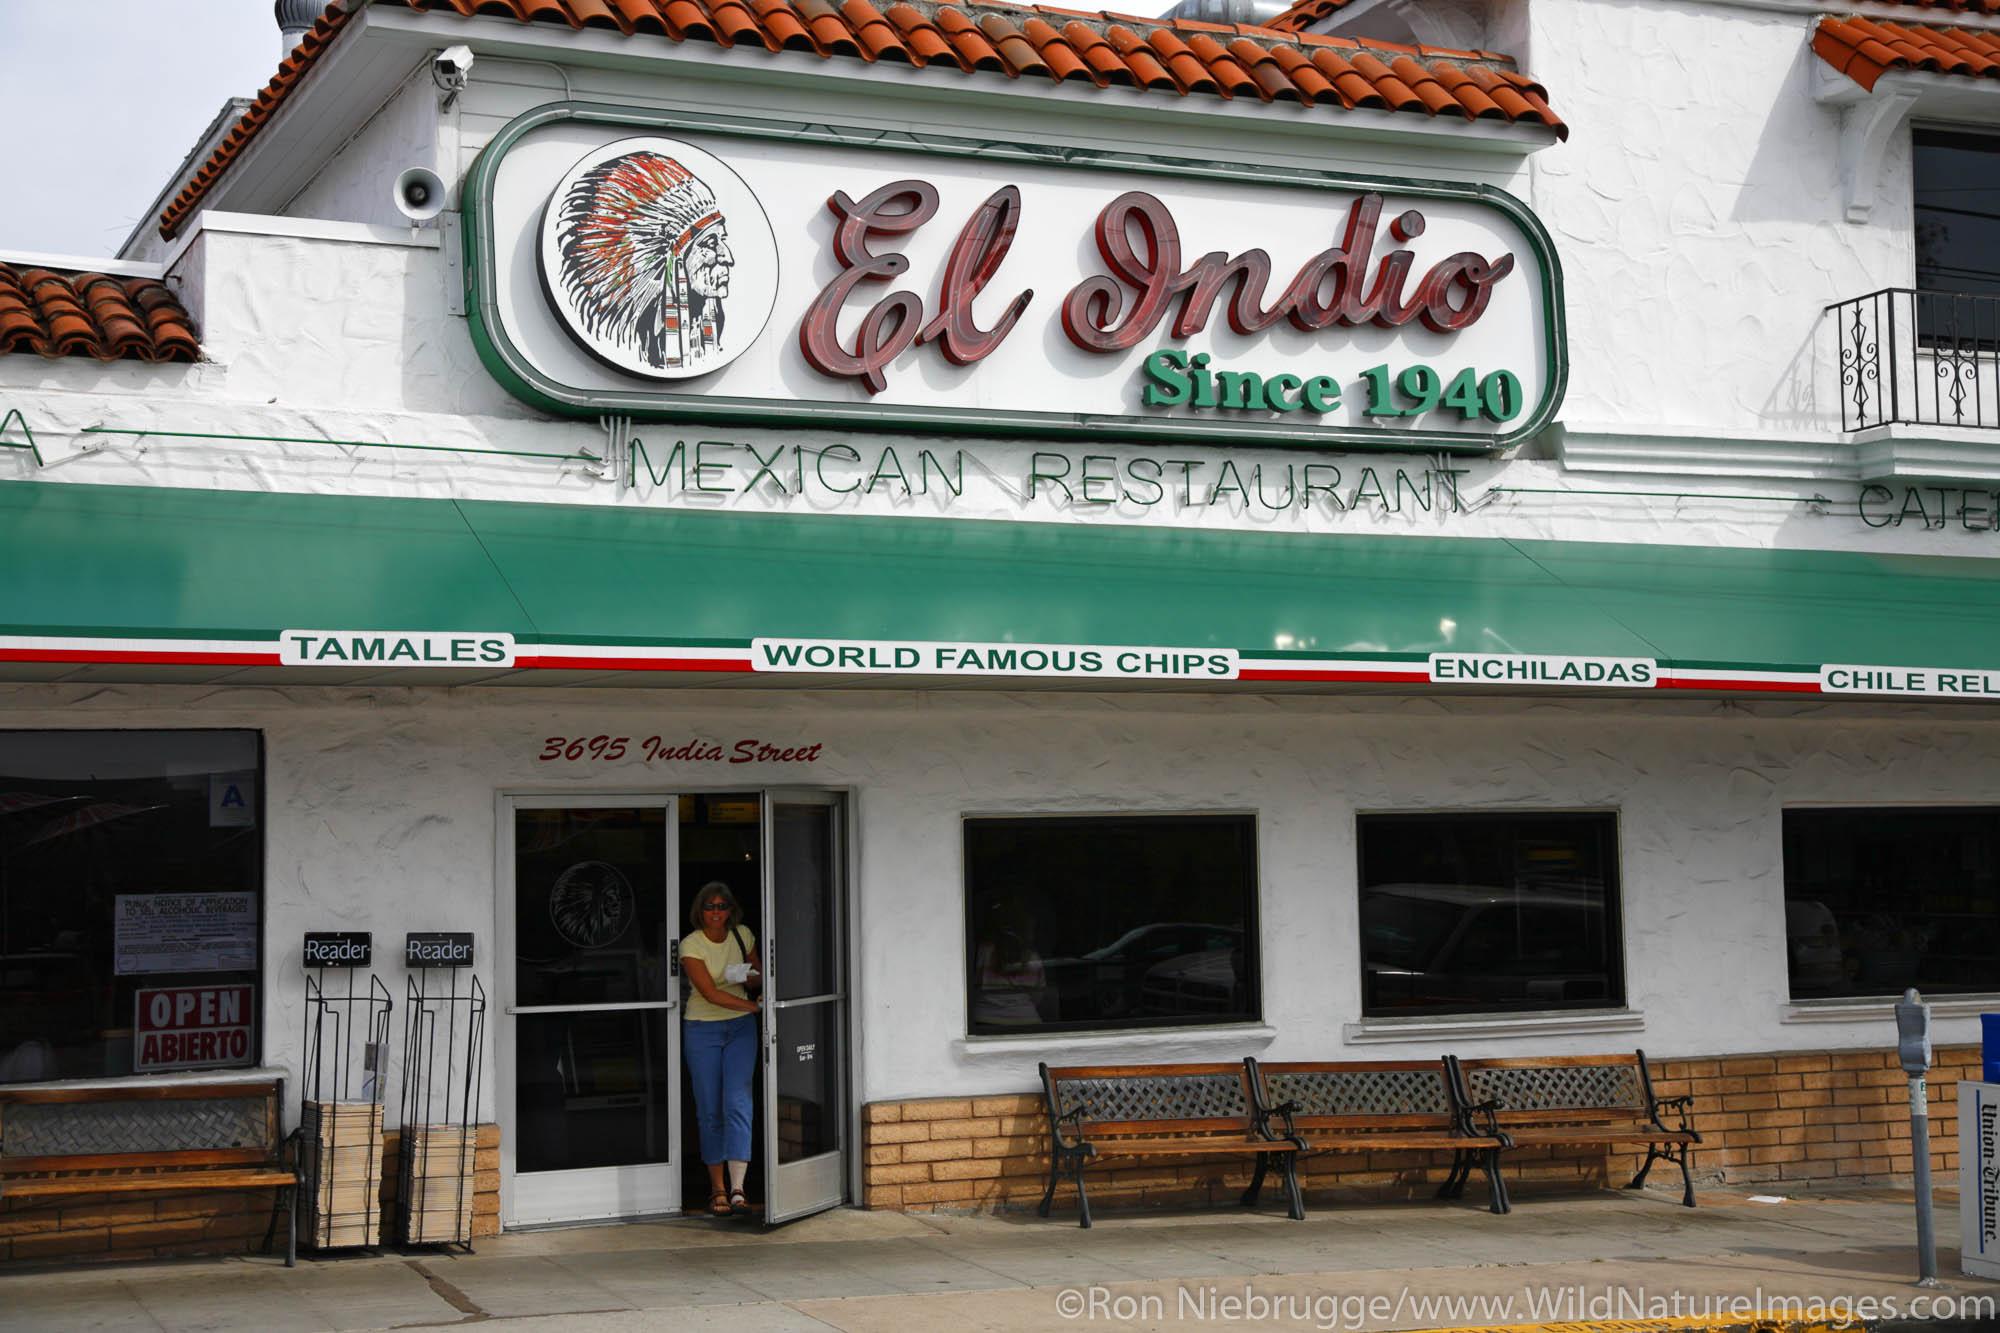 El Indio, a famous Mexican Restaurant in San Diego, California.